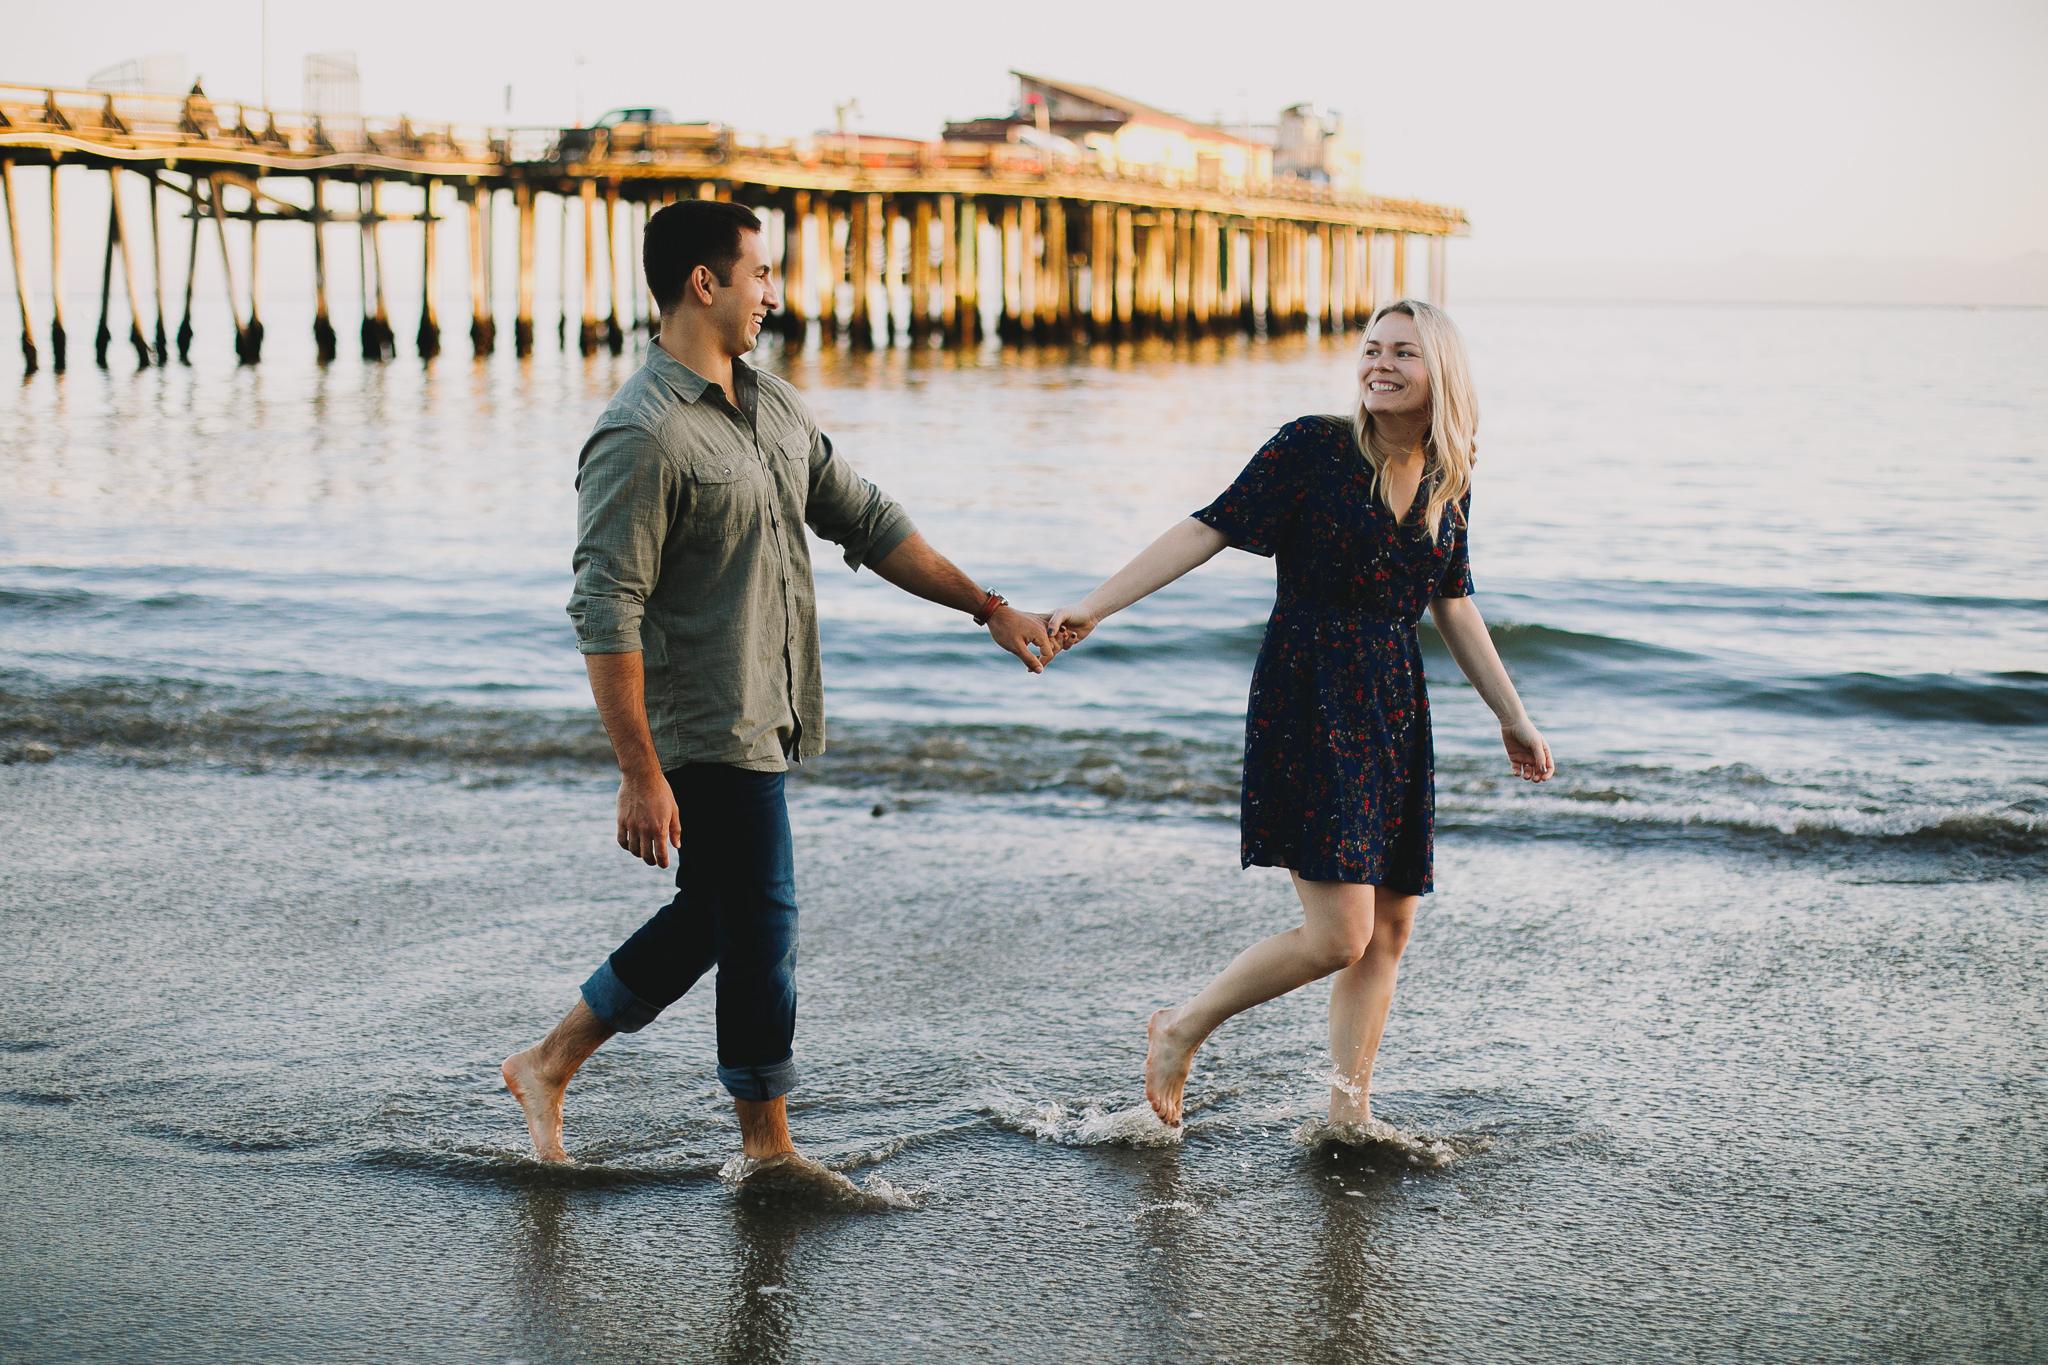 Archer Inspired Photography Capitola Beach Santa Cruz Wedding Engagement Lifestyle Session Photographer-99.jpg